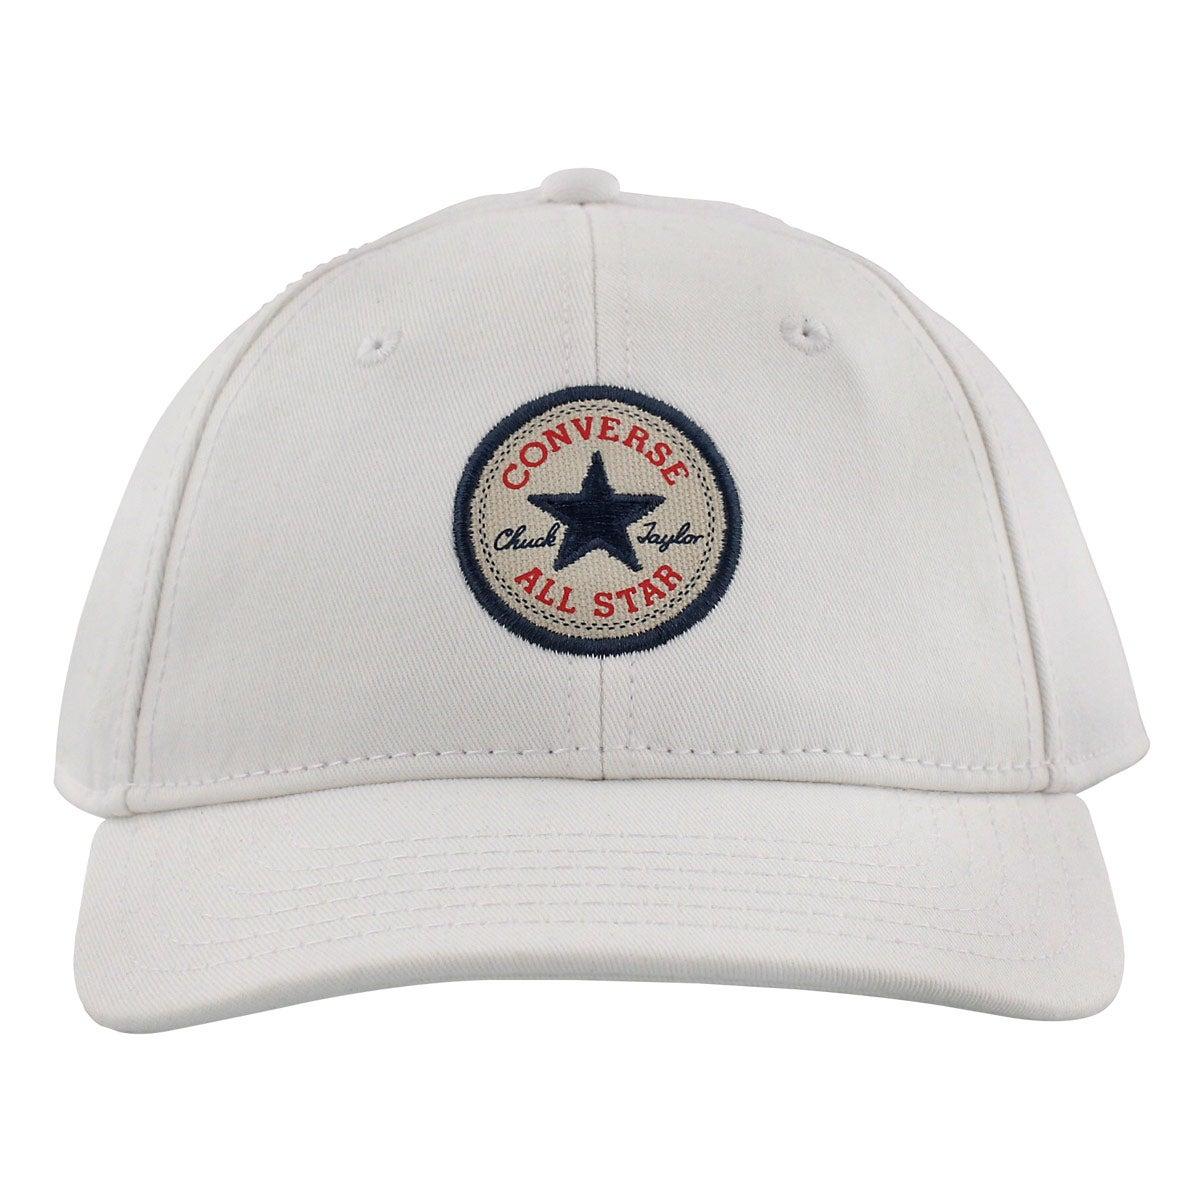 Women's CORE white adjustable precurve cap